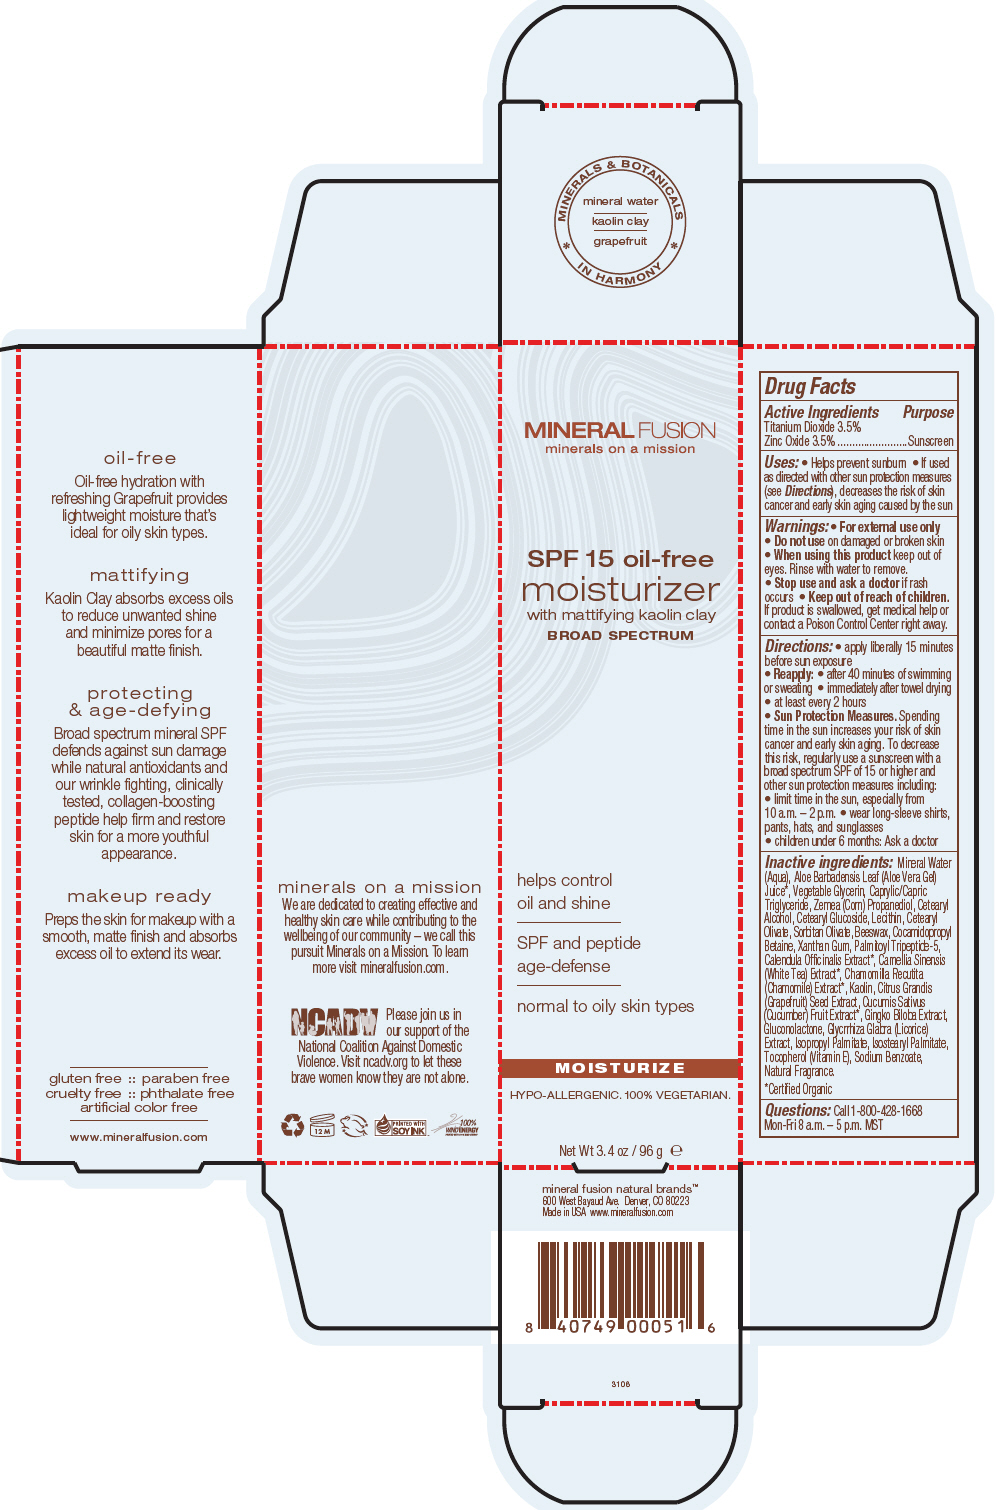 Moisturizer Spf 15 (Titanium Dioxide And Zinc Oxide) Cream [Mineral Fusion Natural Brands]